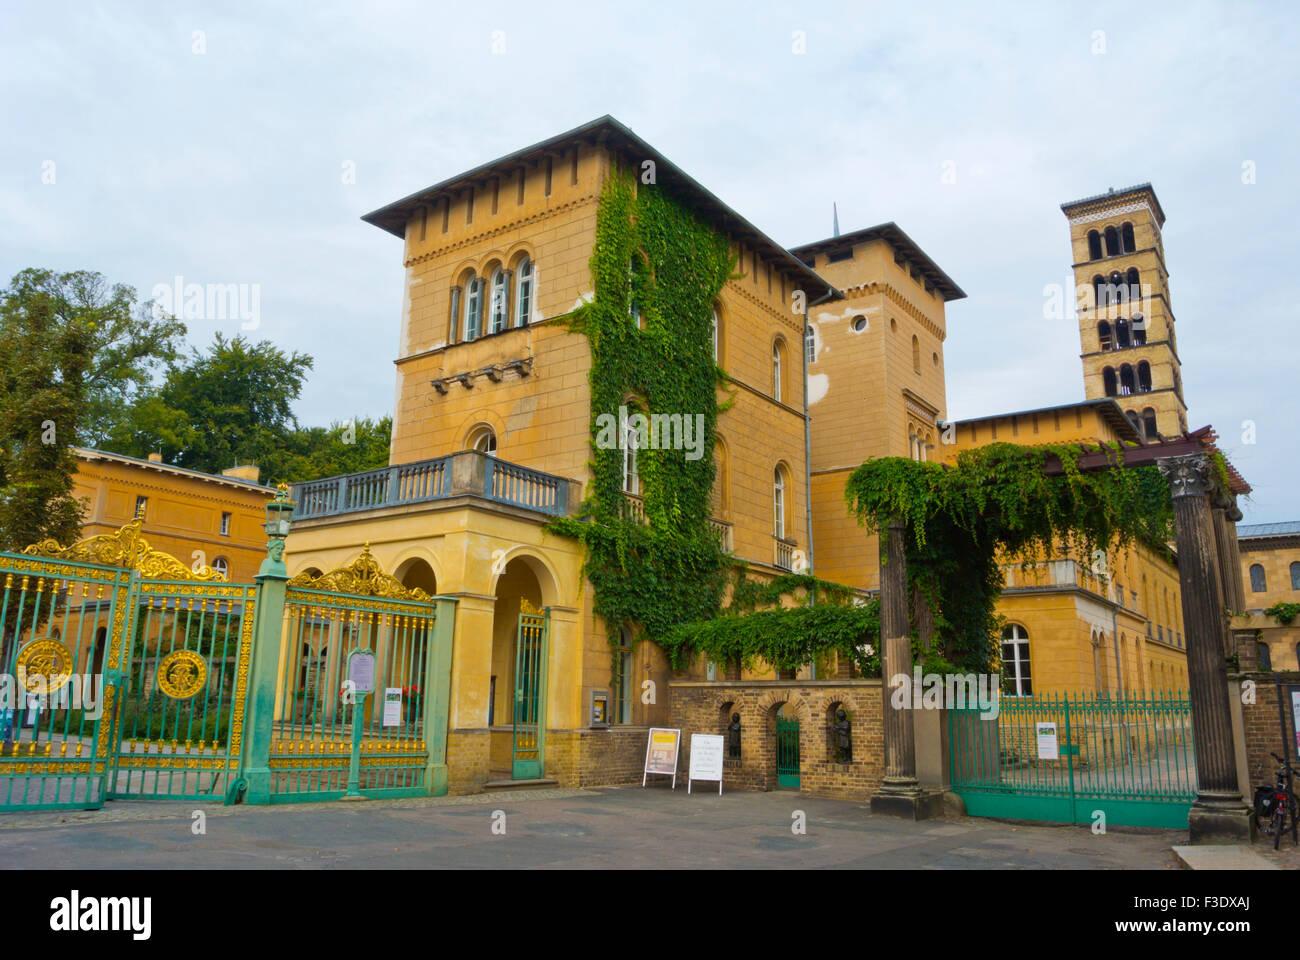 Park Sanssouci gates, with Green Gate and Friedenskirche, church of peace, Potsdam, near Berlin, GermanyG - Stock Image